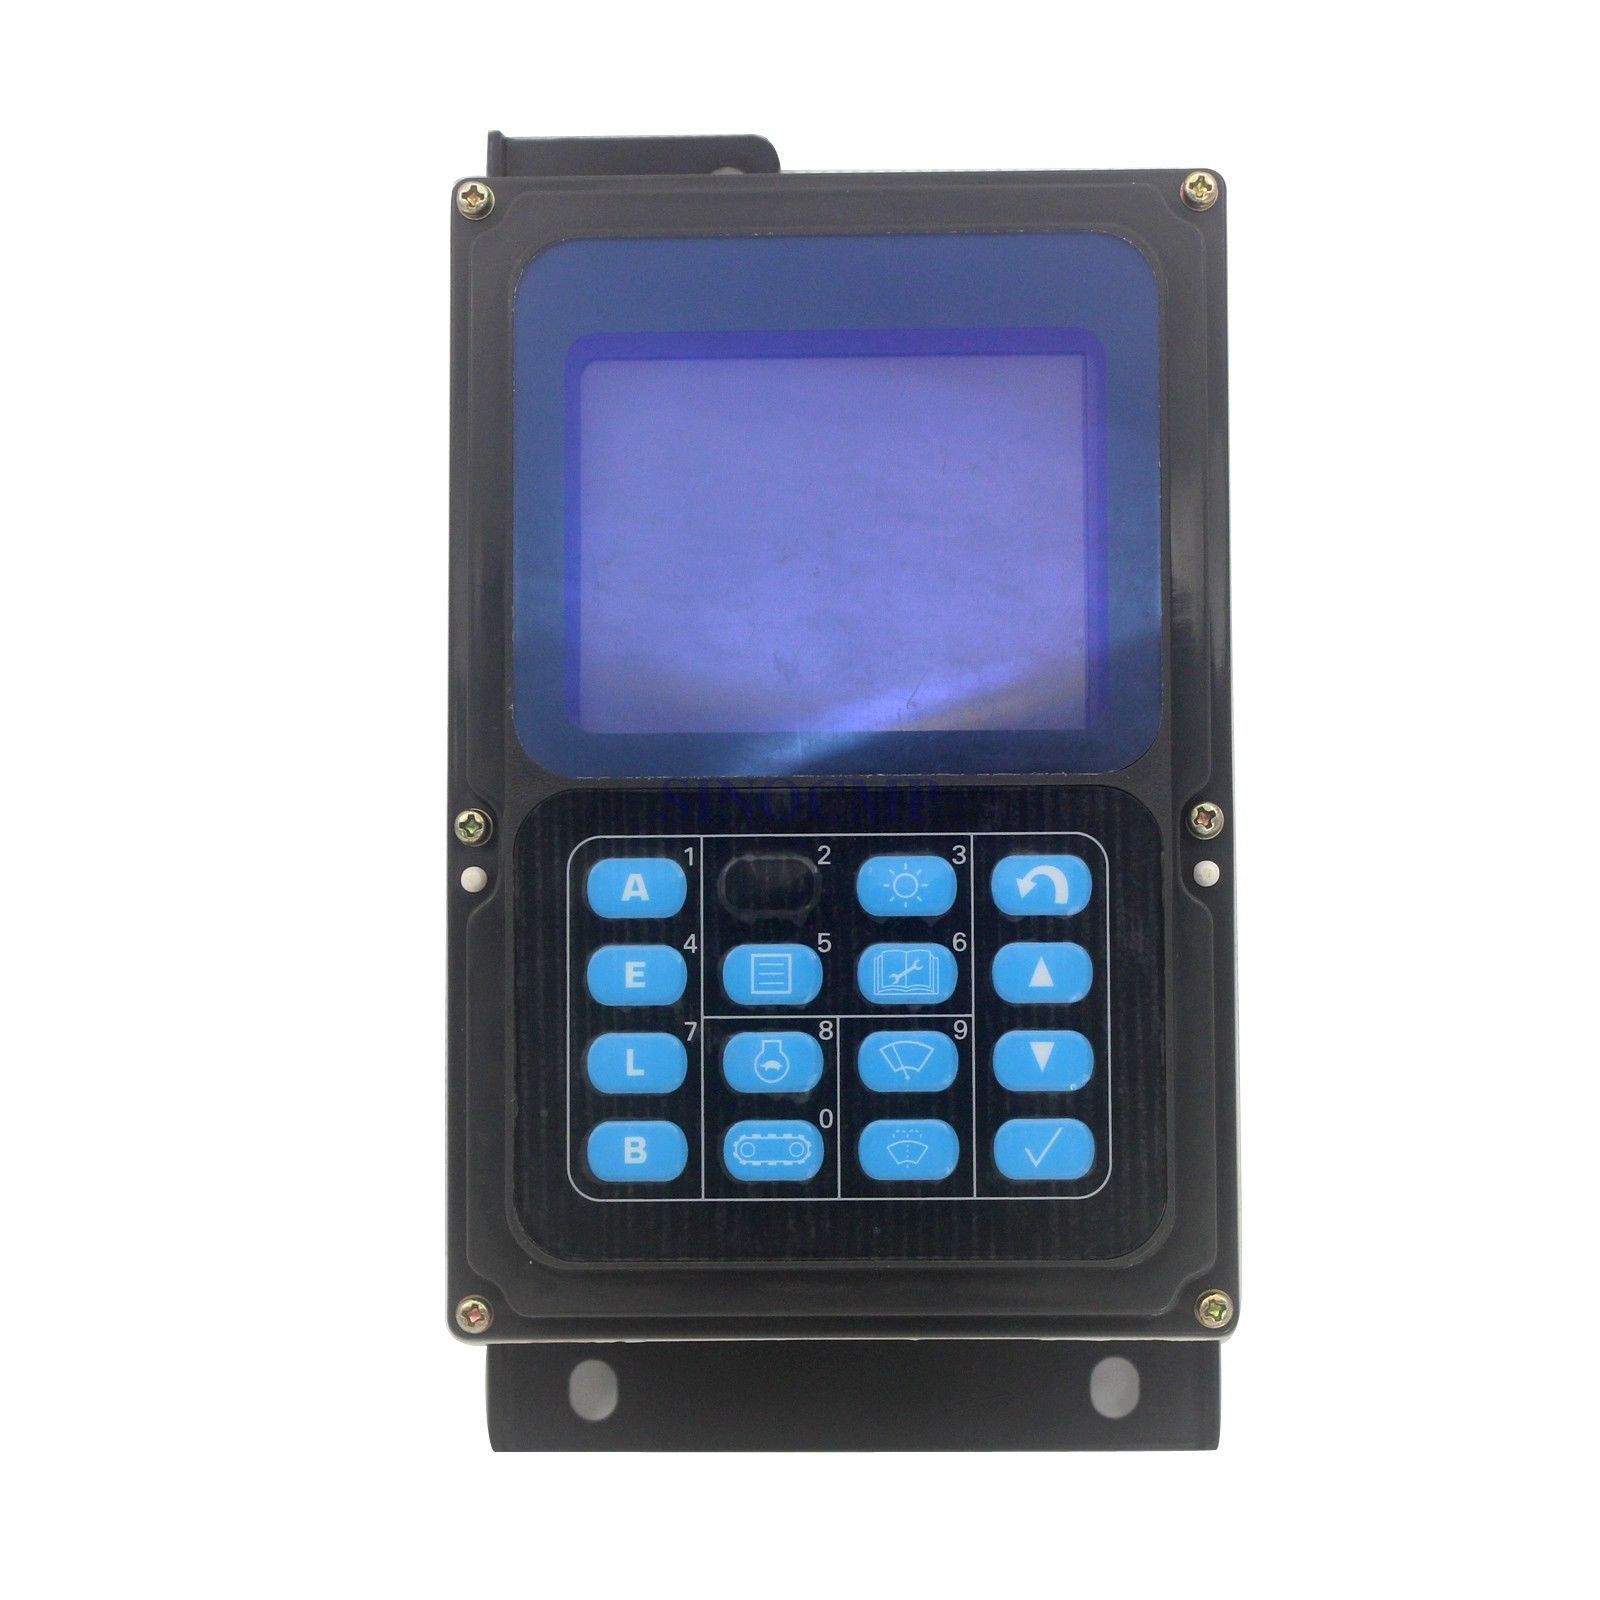 7835-12-2006 7835-12-2007 Excavator Monitor Display Panel For Komatsu PC400-7 PC450-7, 1 year warranty7835-12-2006 7835-12-2007 Excavator Monitor Display Panel For Komatsu PC400-7 PC450-7, 1 year warranty